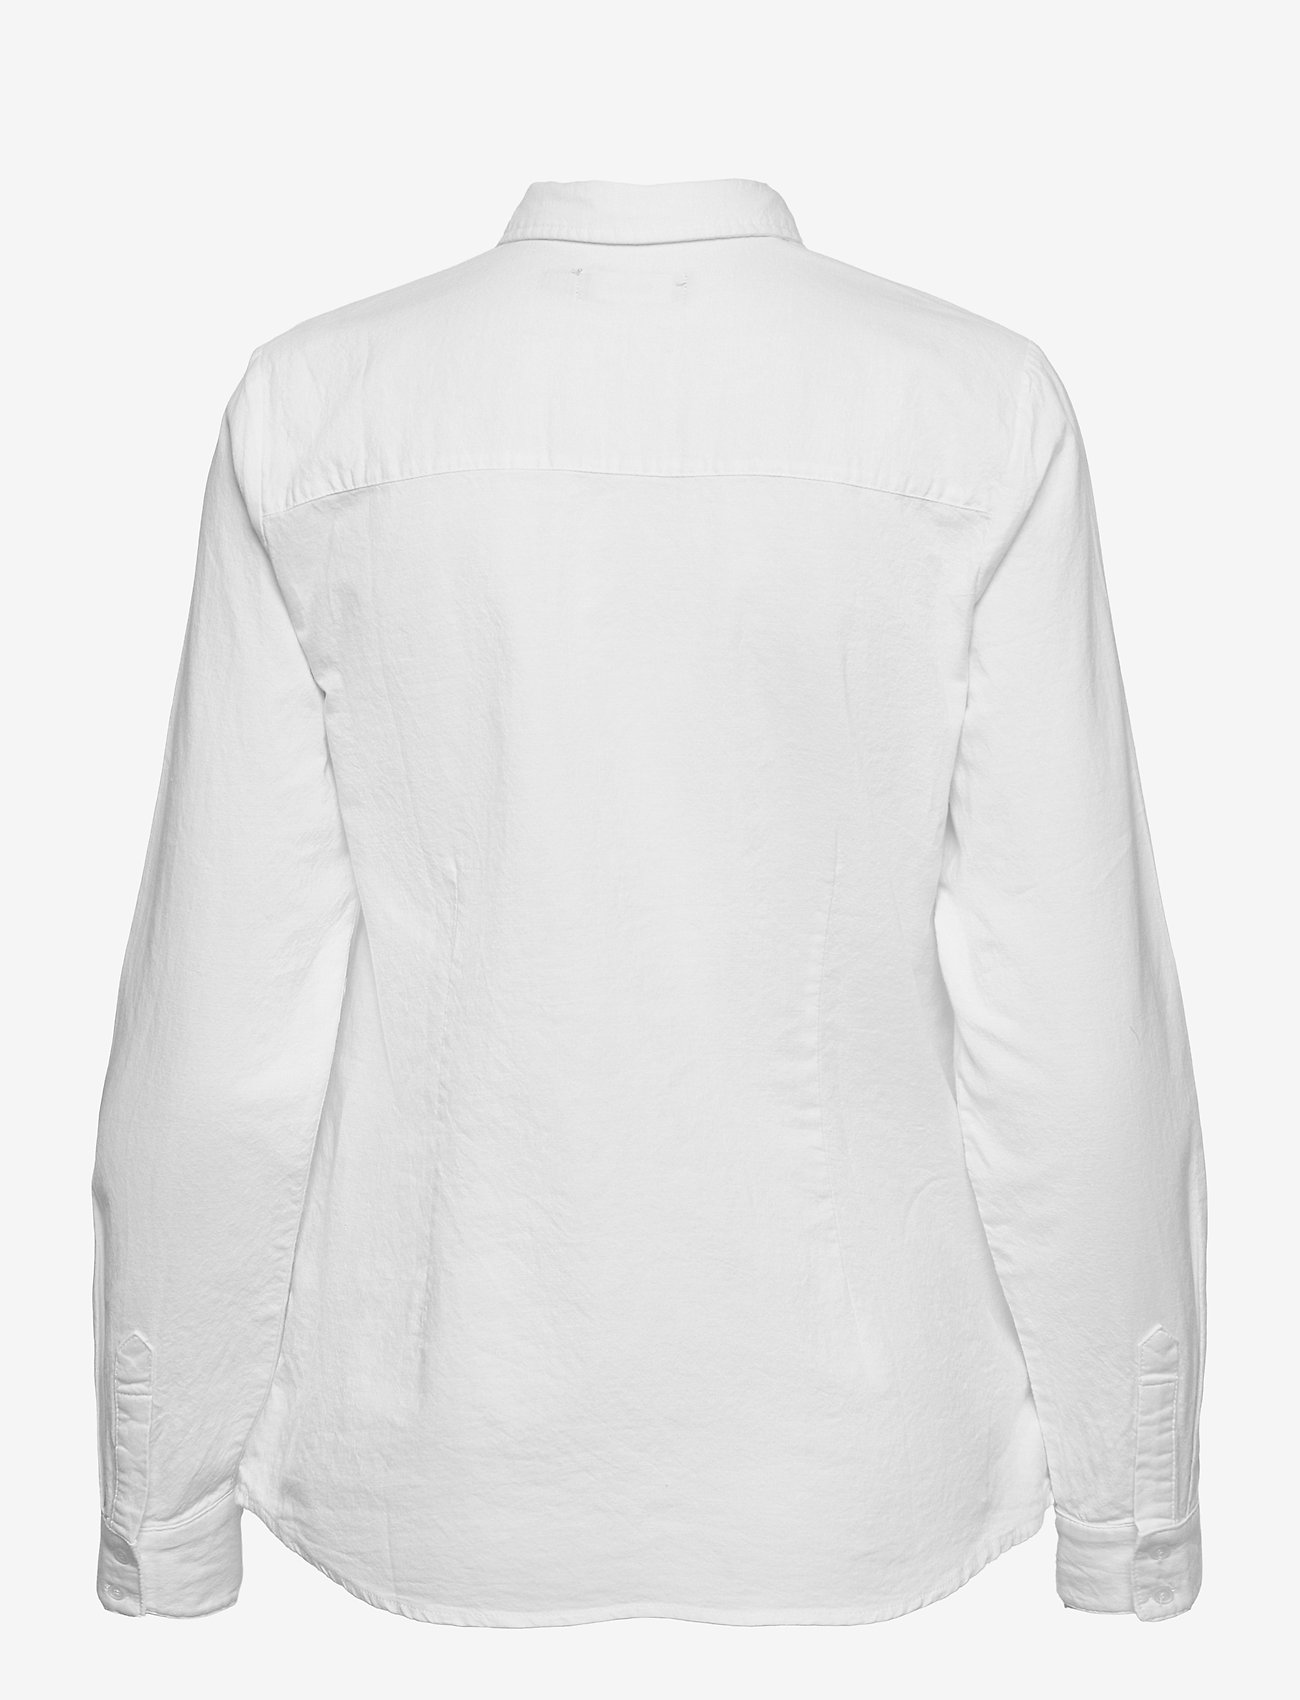 Fransa - FRZAOXFORD 1 Shirt - overhemden met lange mouwen - white - 1